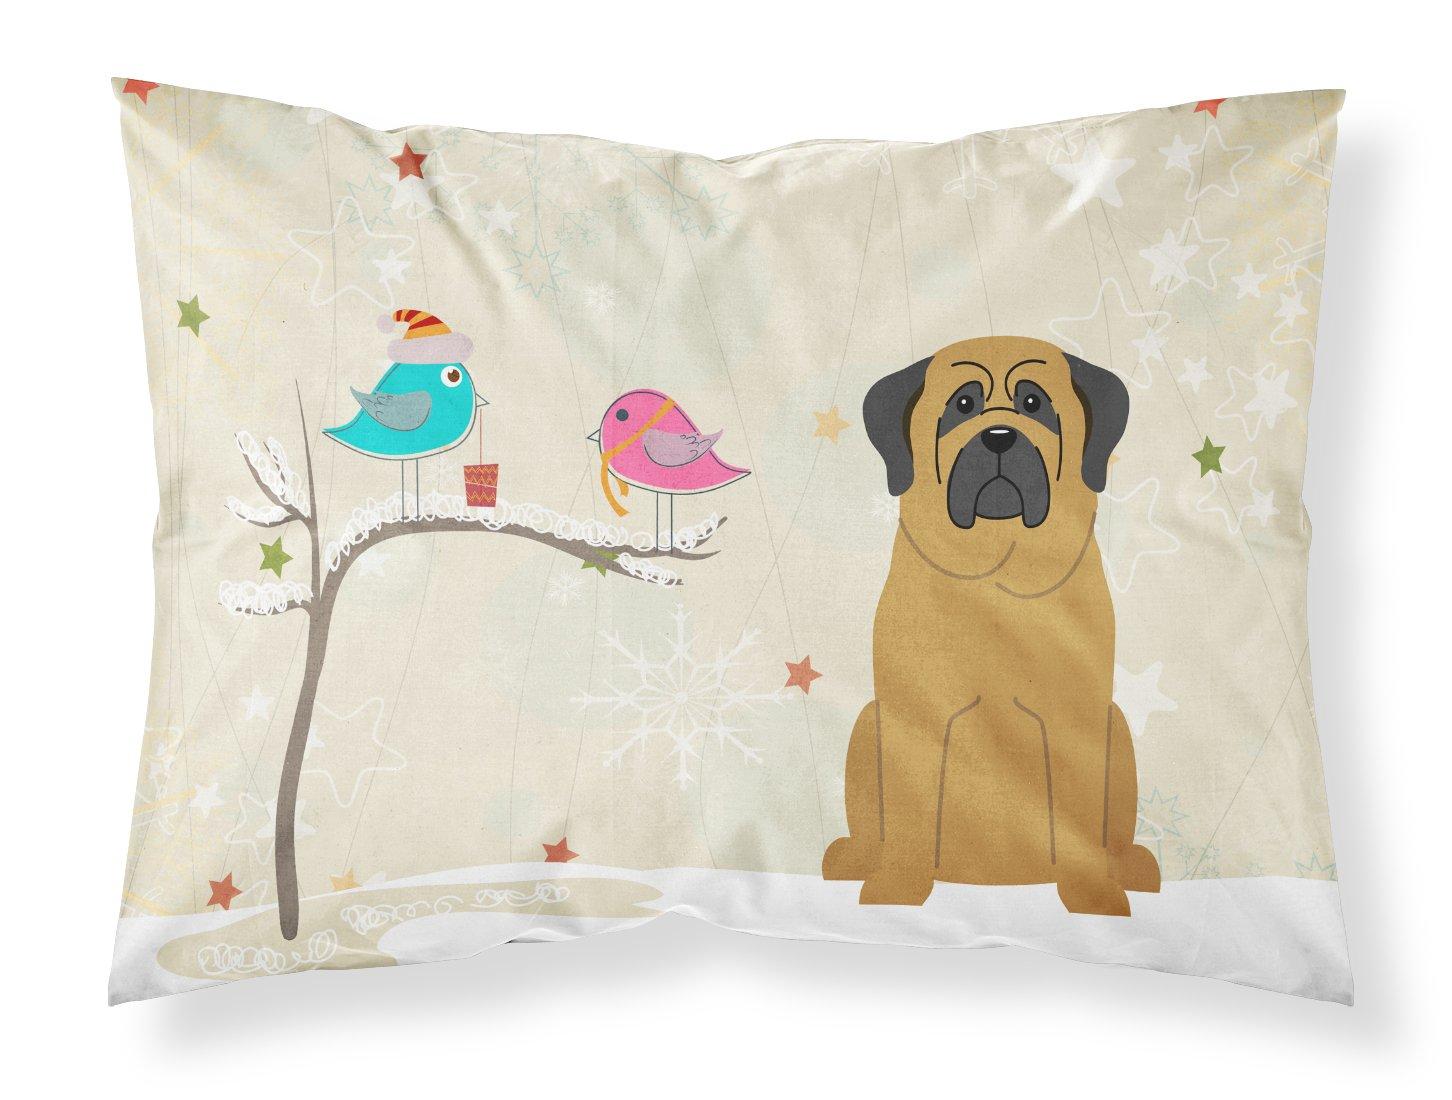 Carolines Treasures Between Friends Mastiff Fabric Standard Pillowcase BB2490PILLOWCASE Multicolor